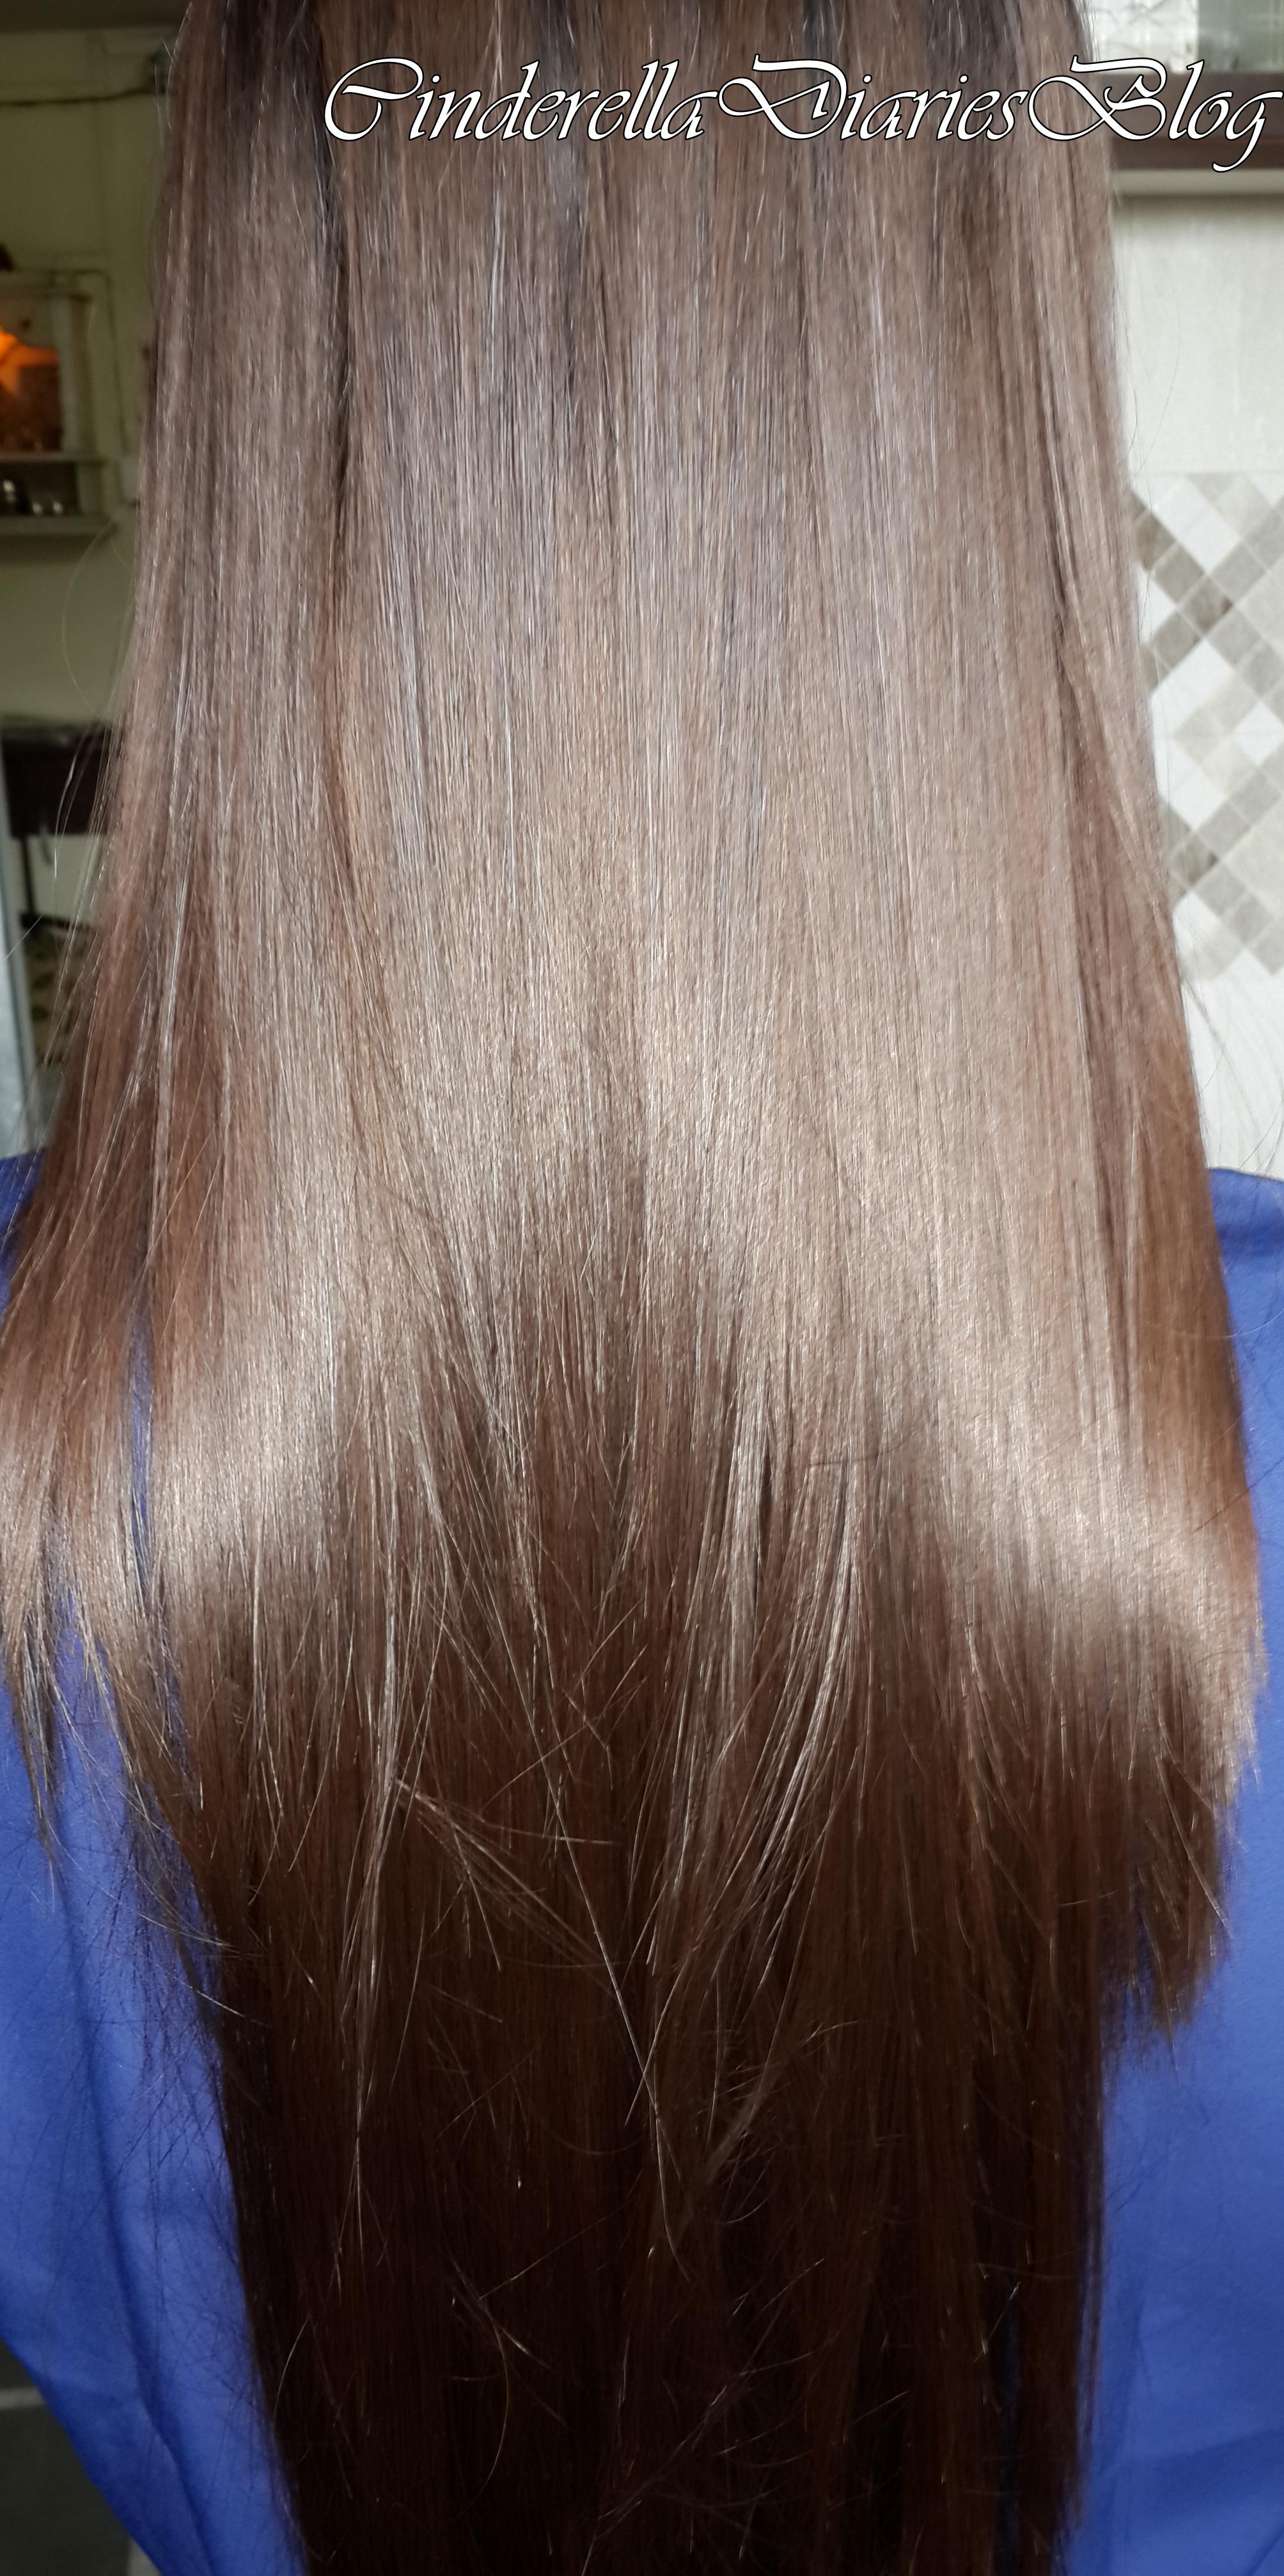 Godrej Nupur Coconut Henna Creme Hair Color Review Cinderella